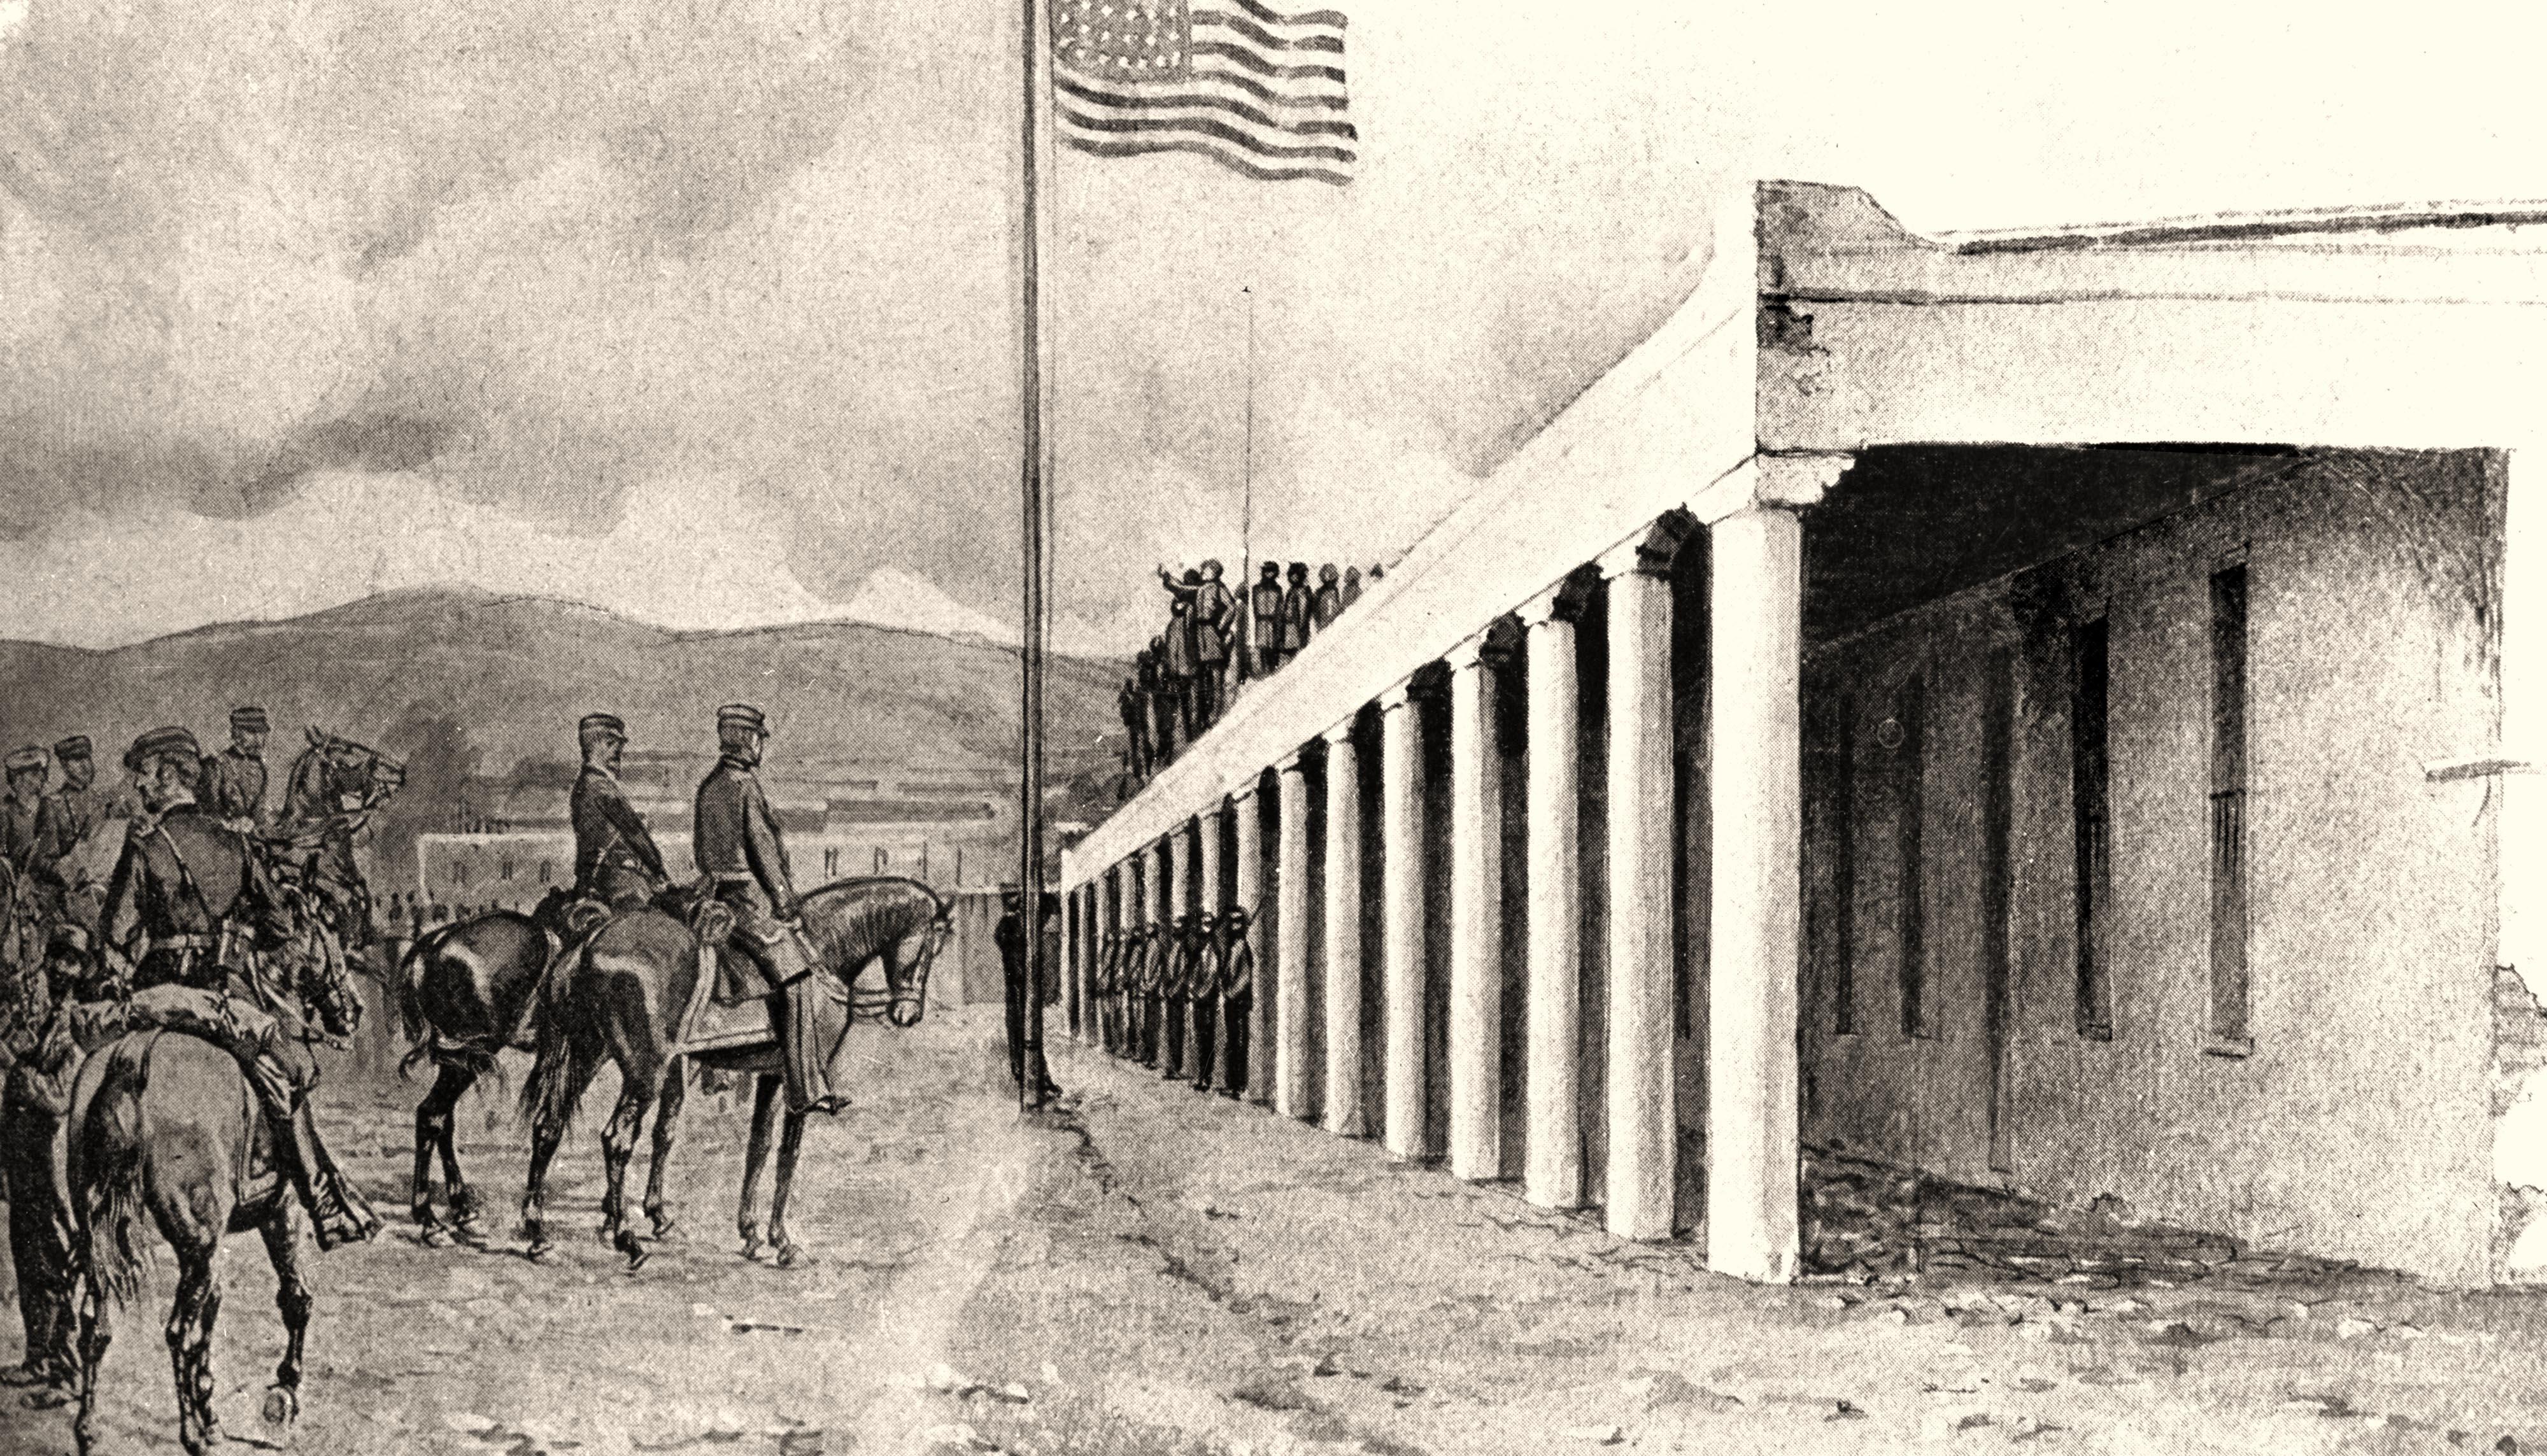 2_Taming-New-Mexico_NM-PBS_Palace-of-the-Governors_Santa-Fe_POG-sketch.jpg